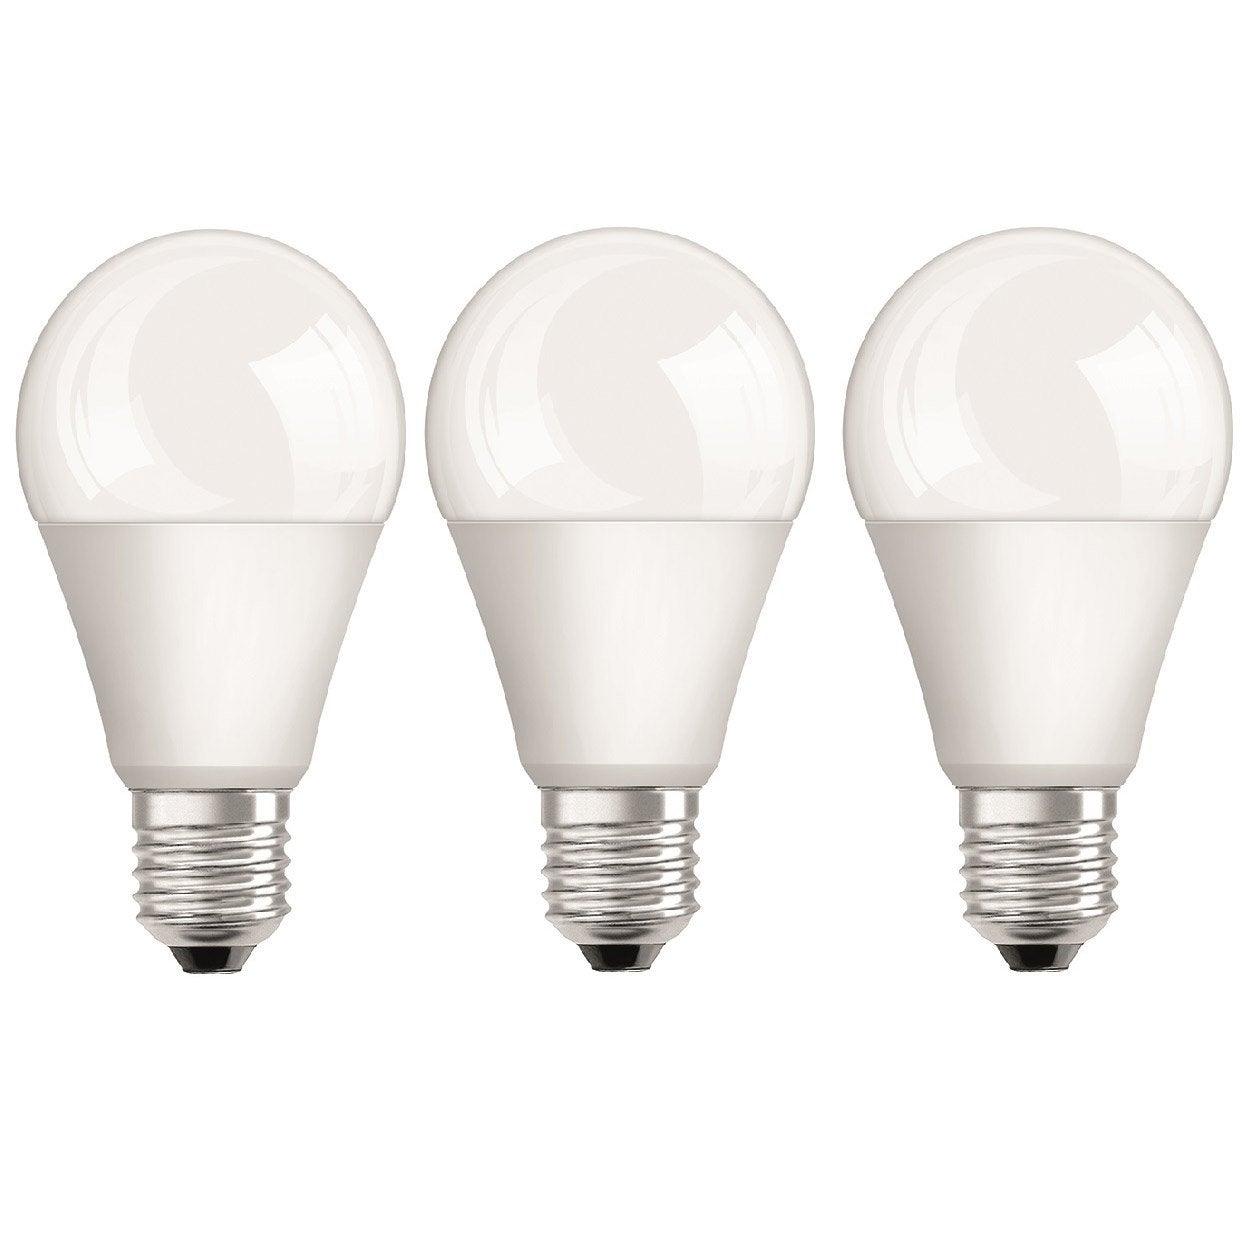 ampoule led e27 9 5w 806lm quiv 60w 2700k osram lot. Black Bedroom Furniture Sets. Home Design Ideas